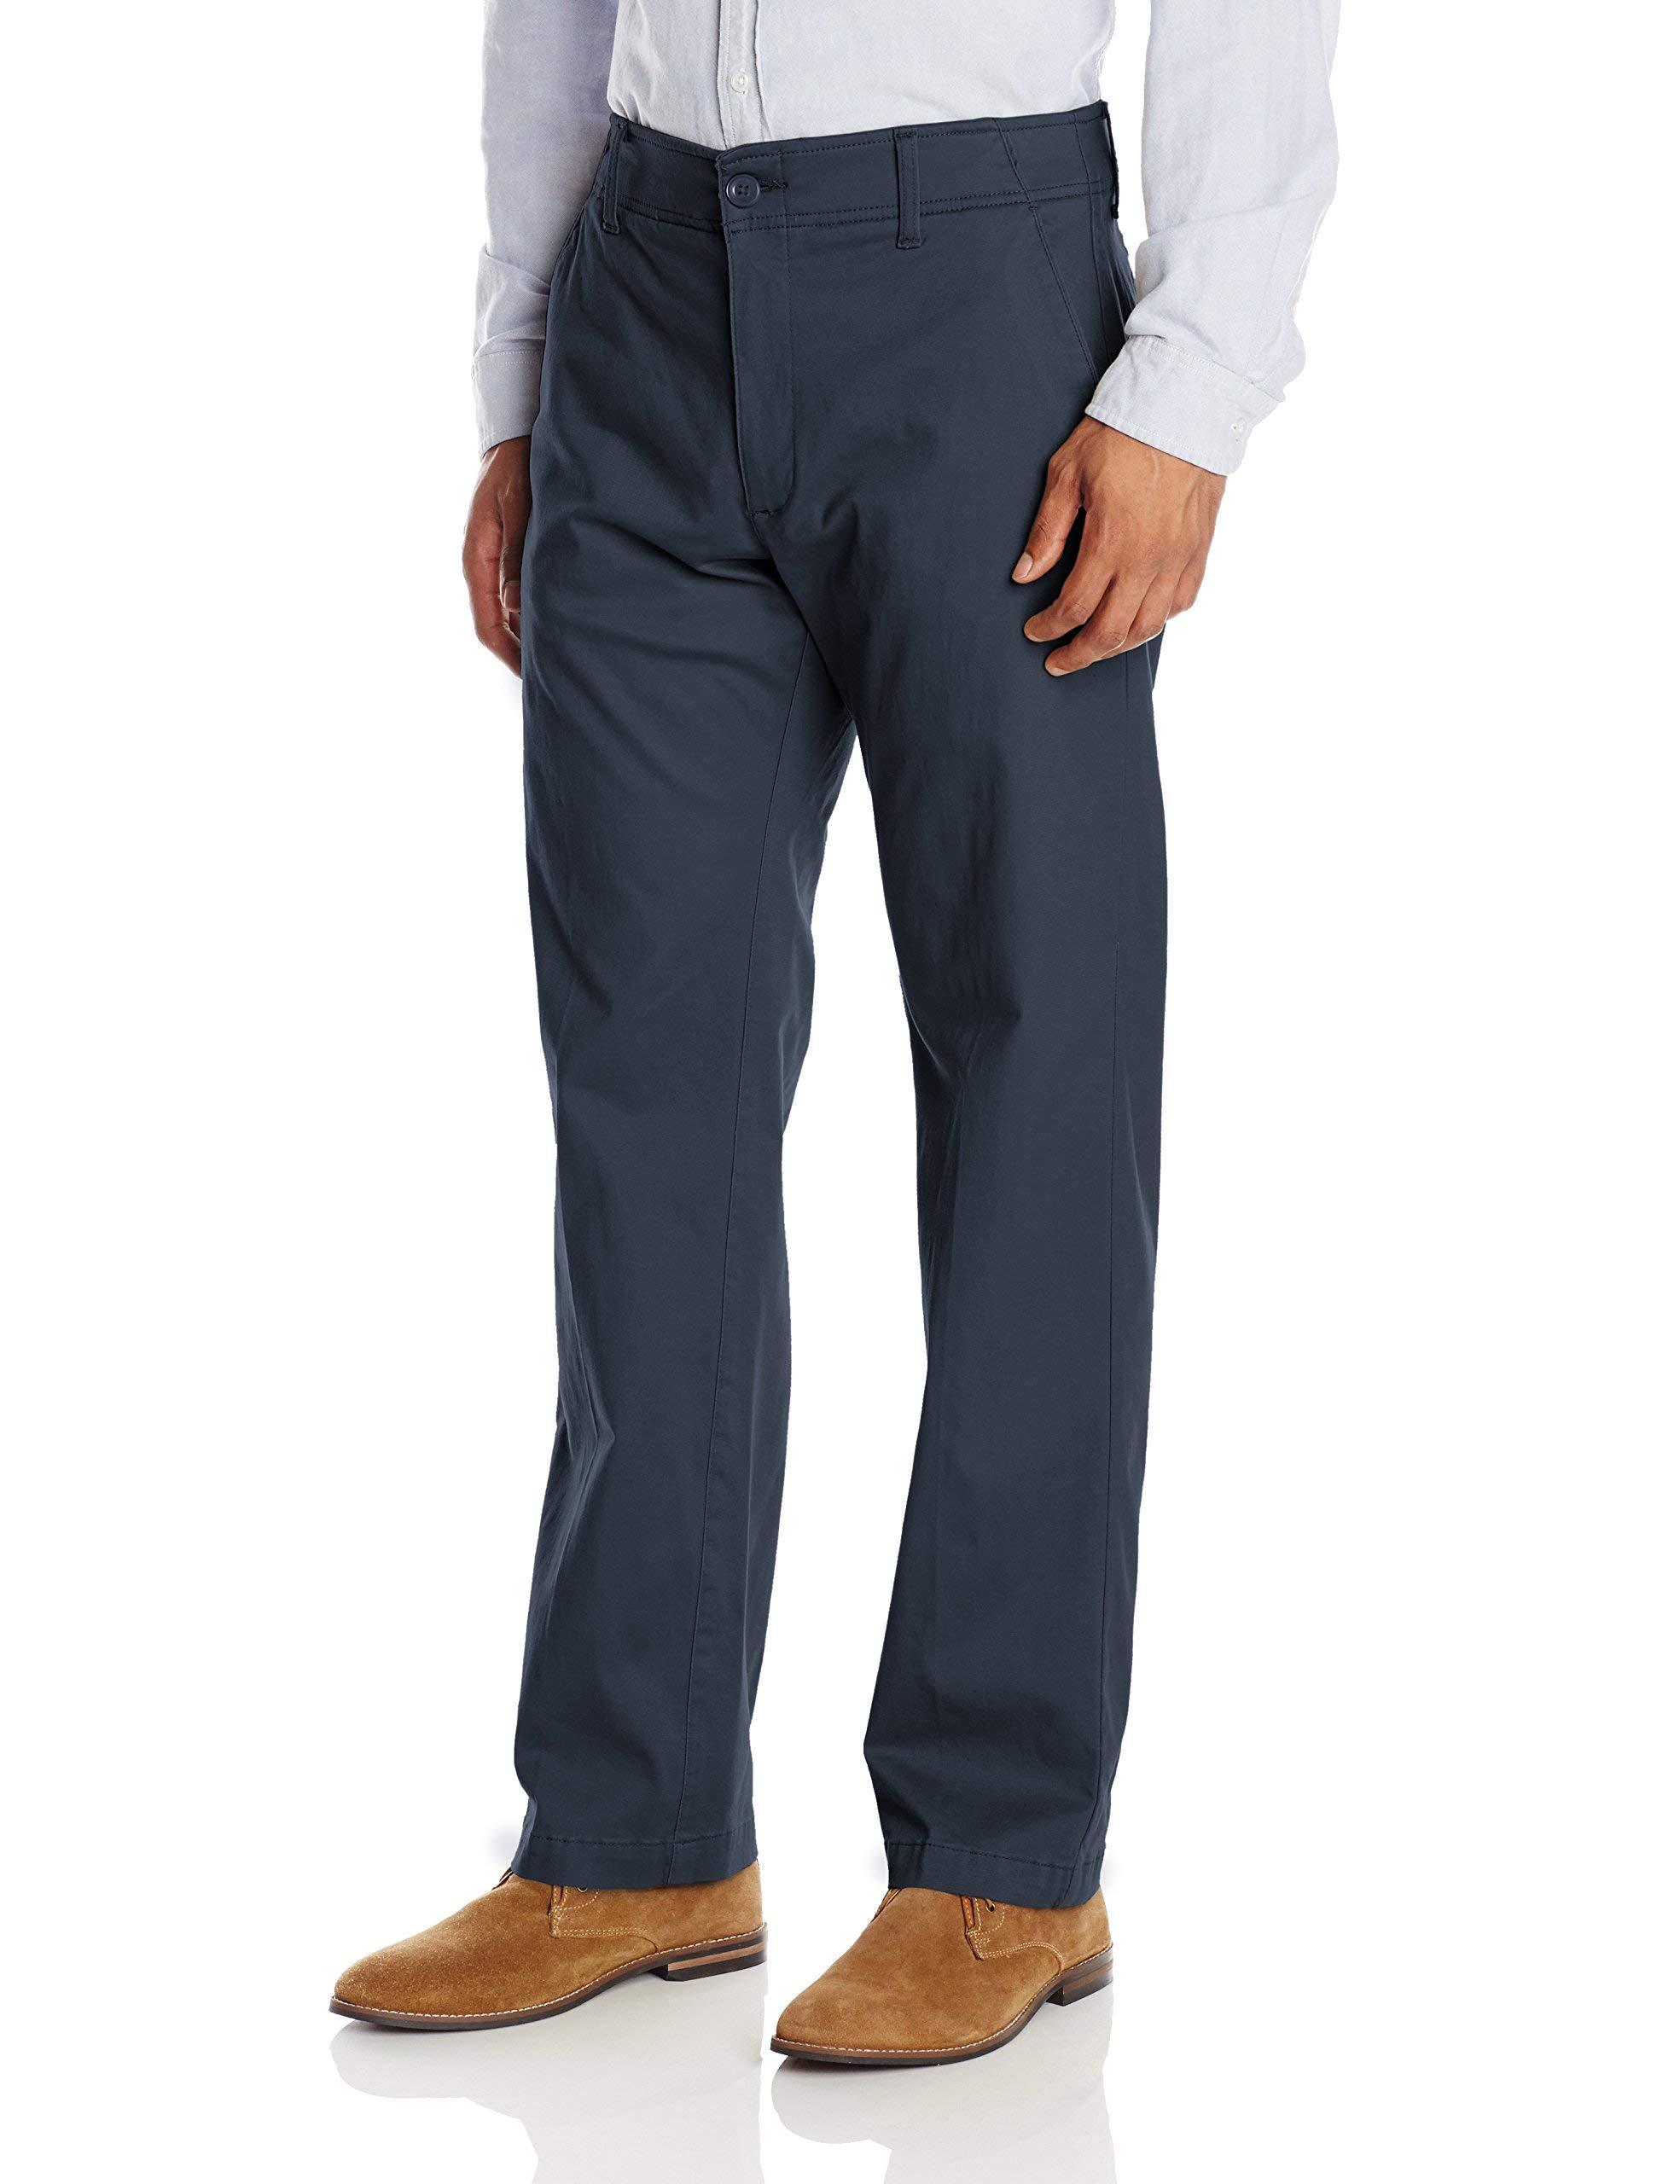 LEE Men's Big & Tall Performance Series Extreme Comfort Pant, Navy, 48W x 30L